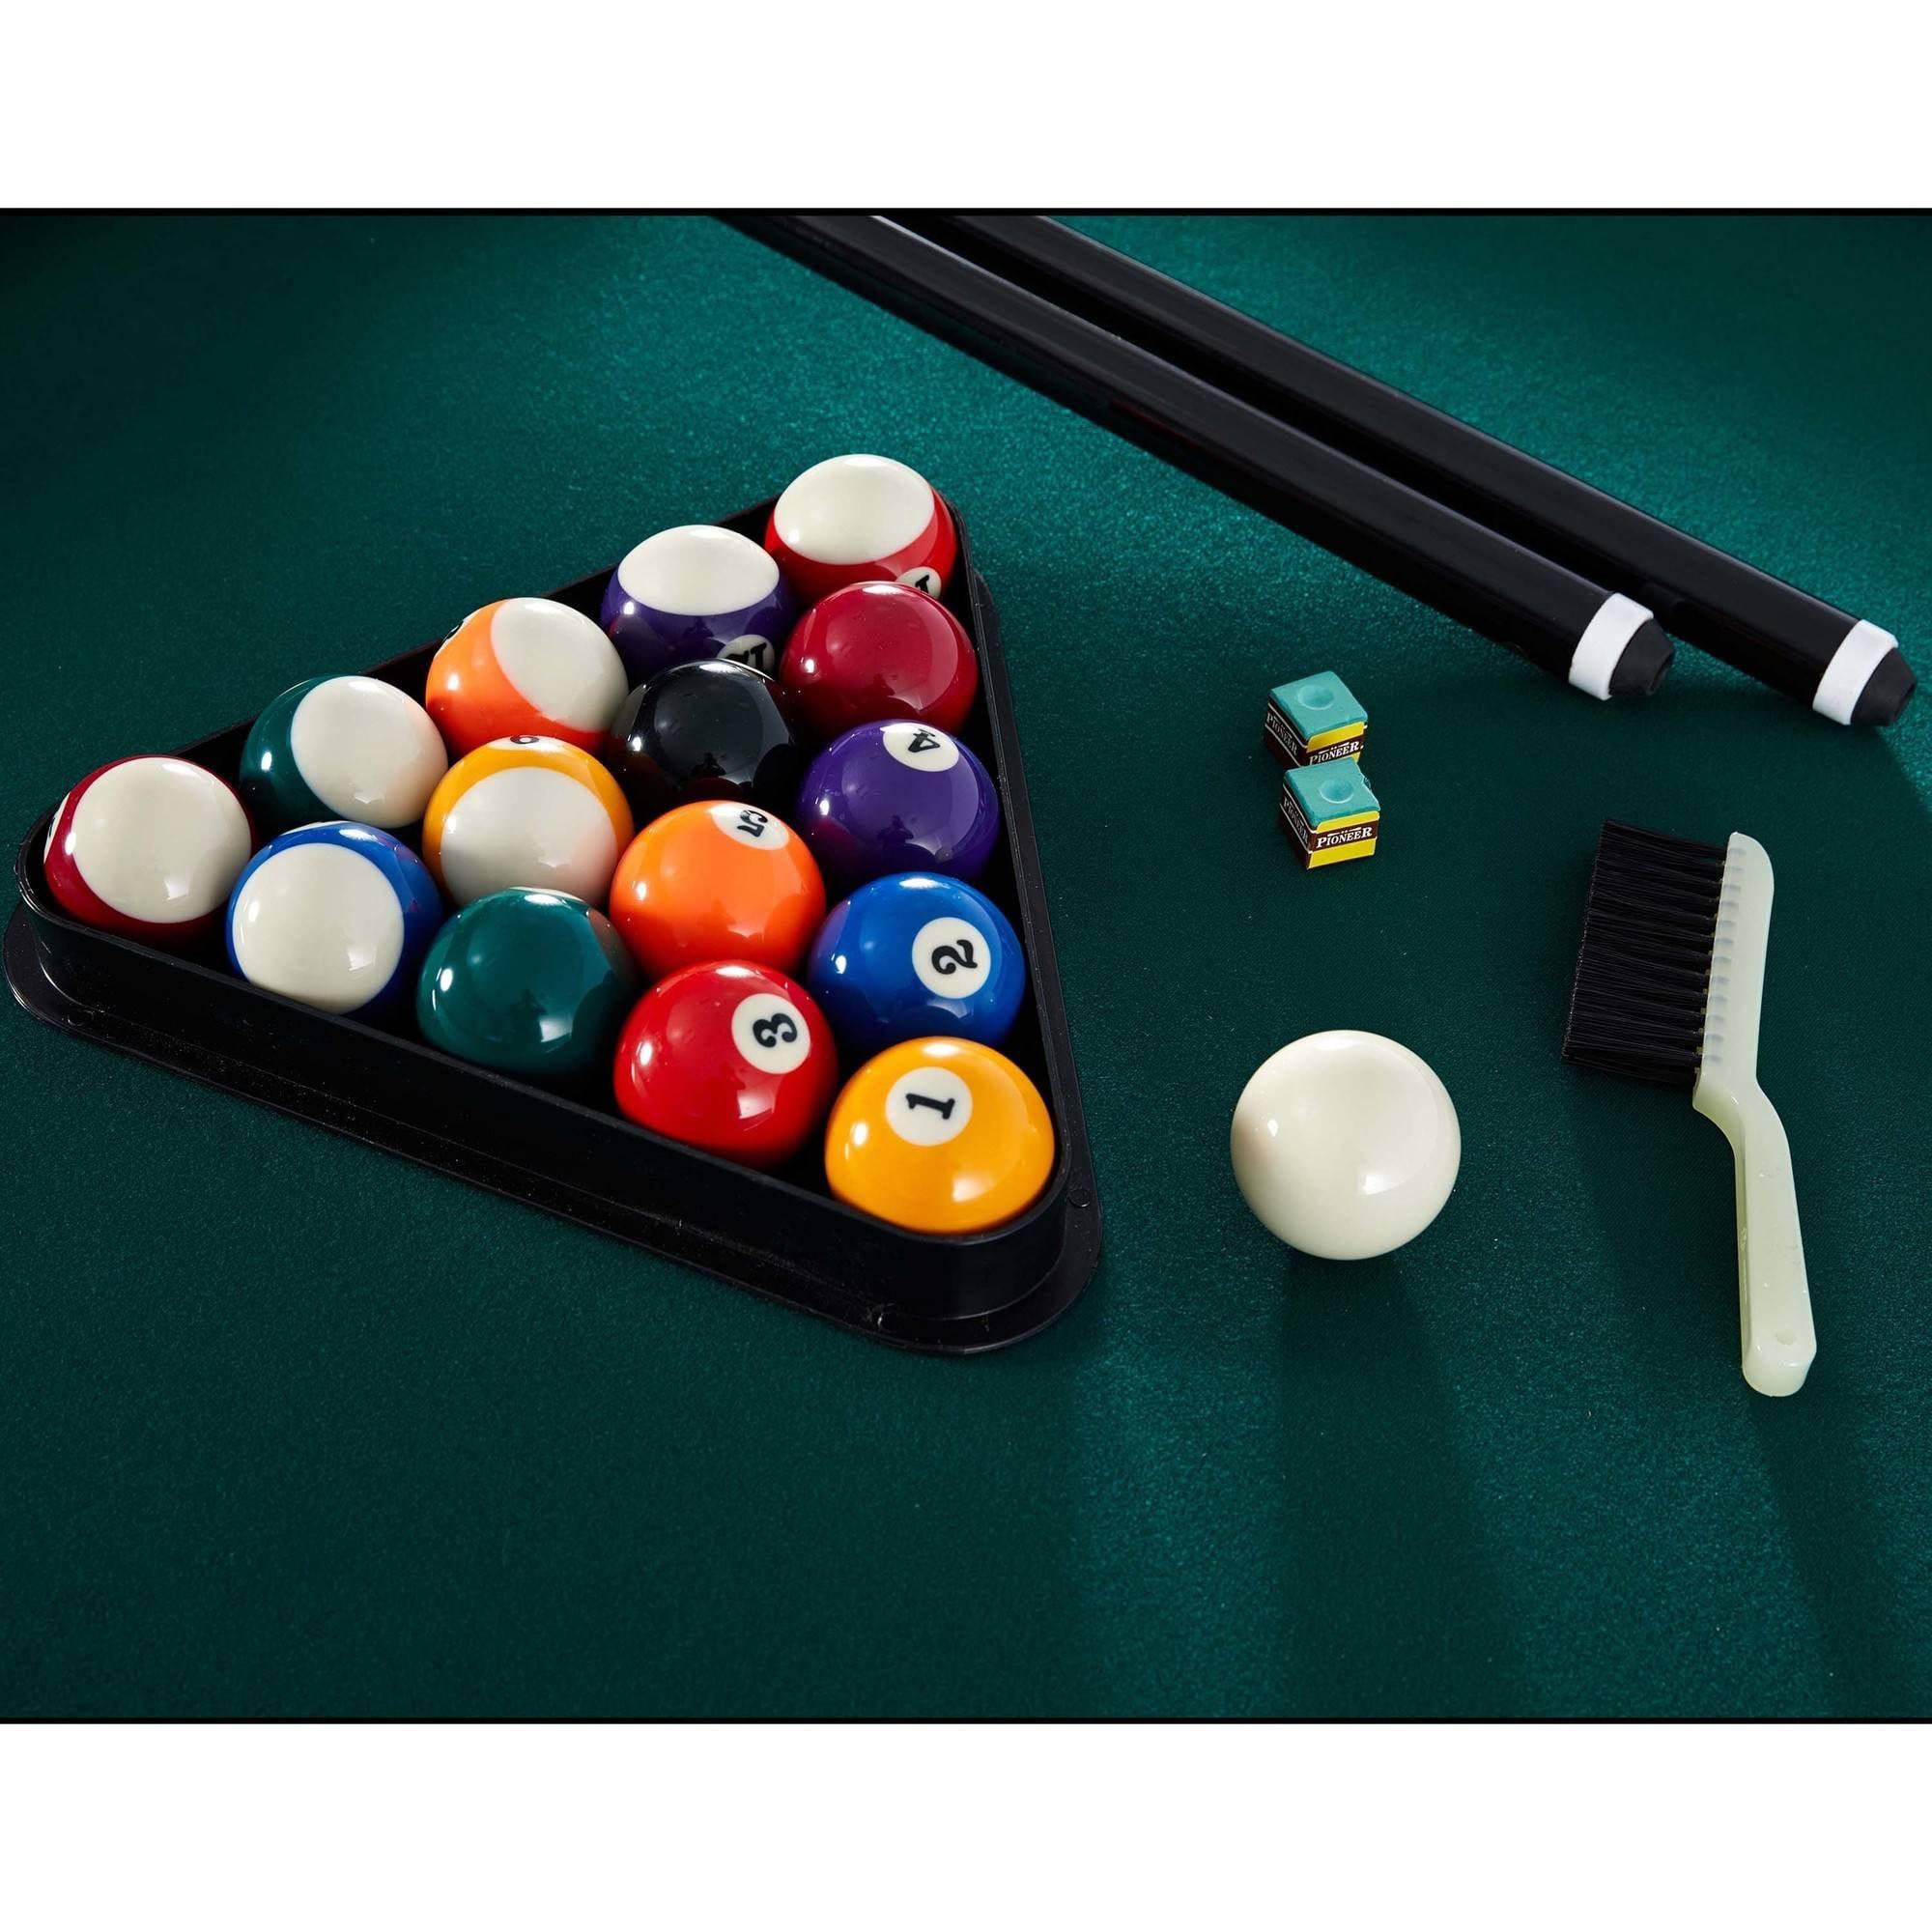 Billiard Pool Table With Bonus Dartboard Set Inch EBay - 84 pool table